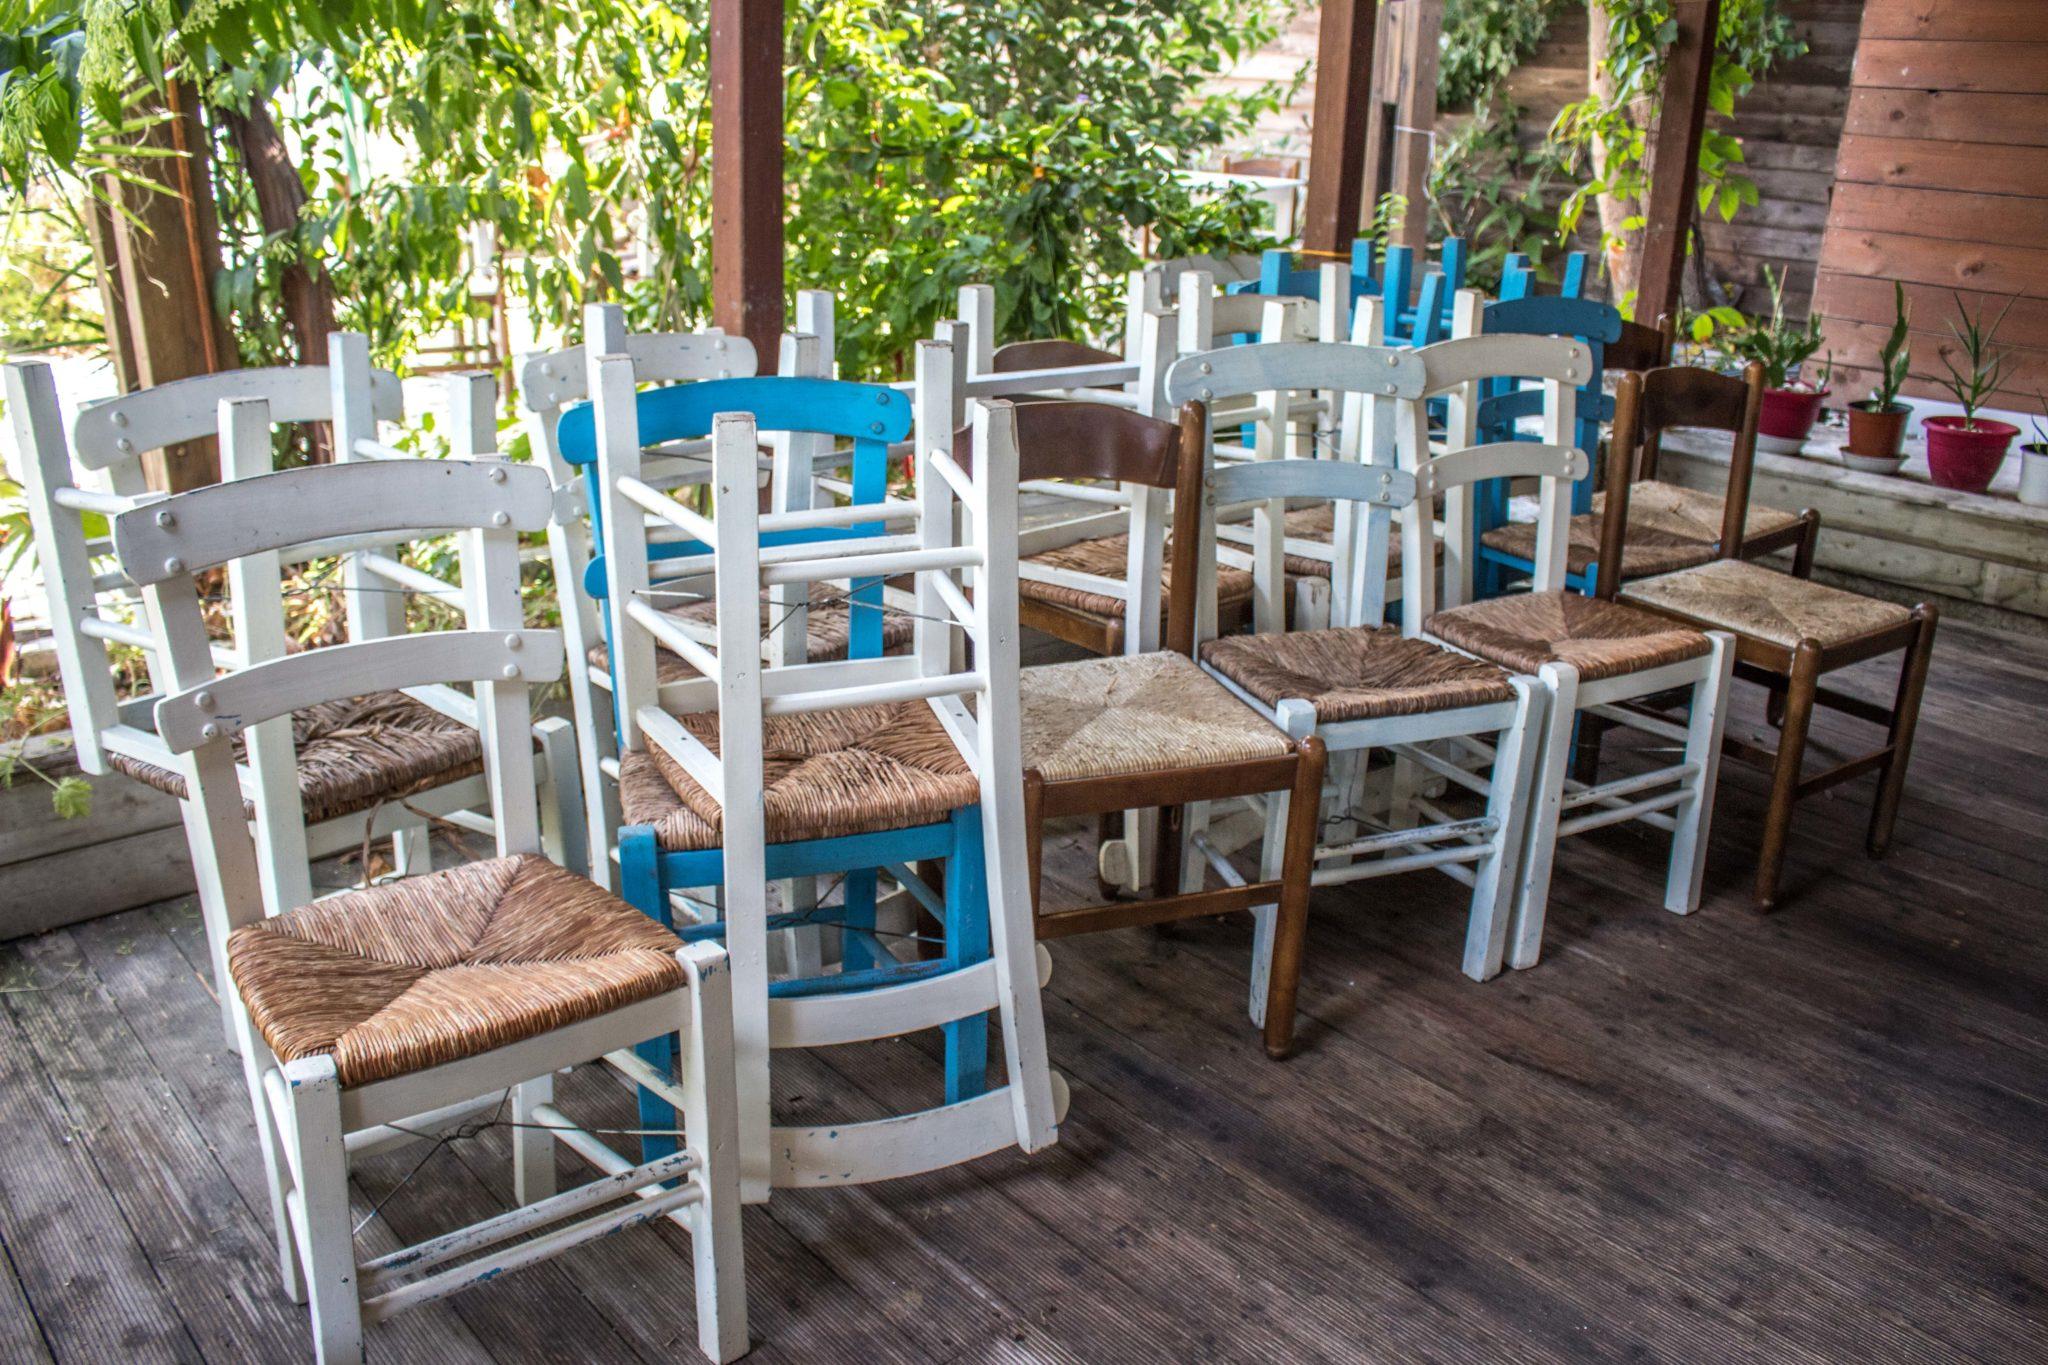 Kuchnia jońska – co zjeść na Zakynthos i Kefalonii?